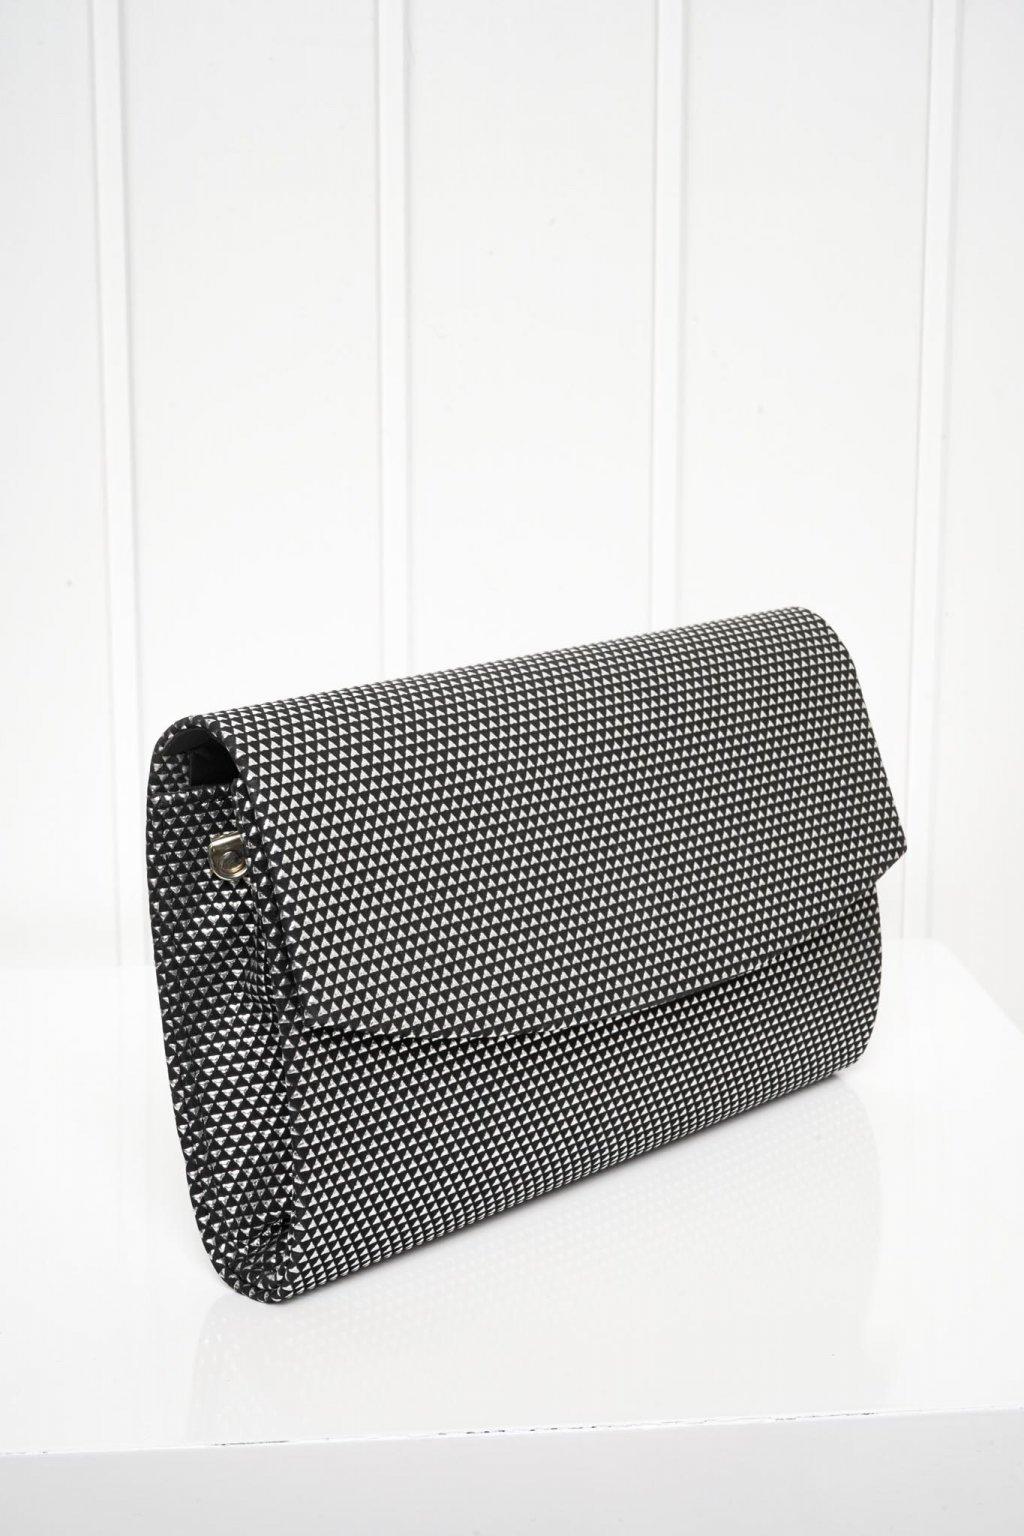 Kabelka, crossbody, ruksak, shopping bag, shopperka, 563